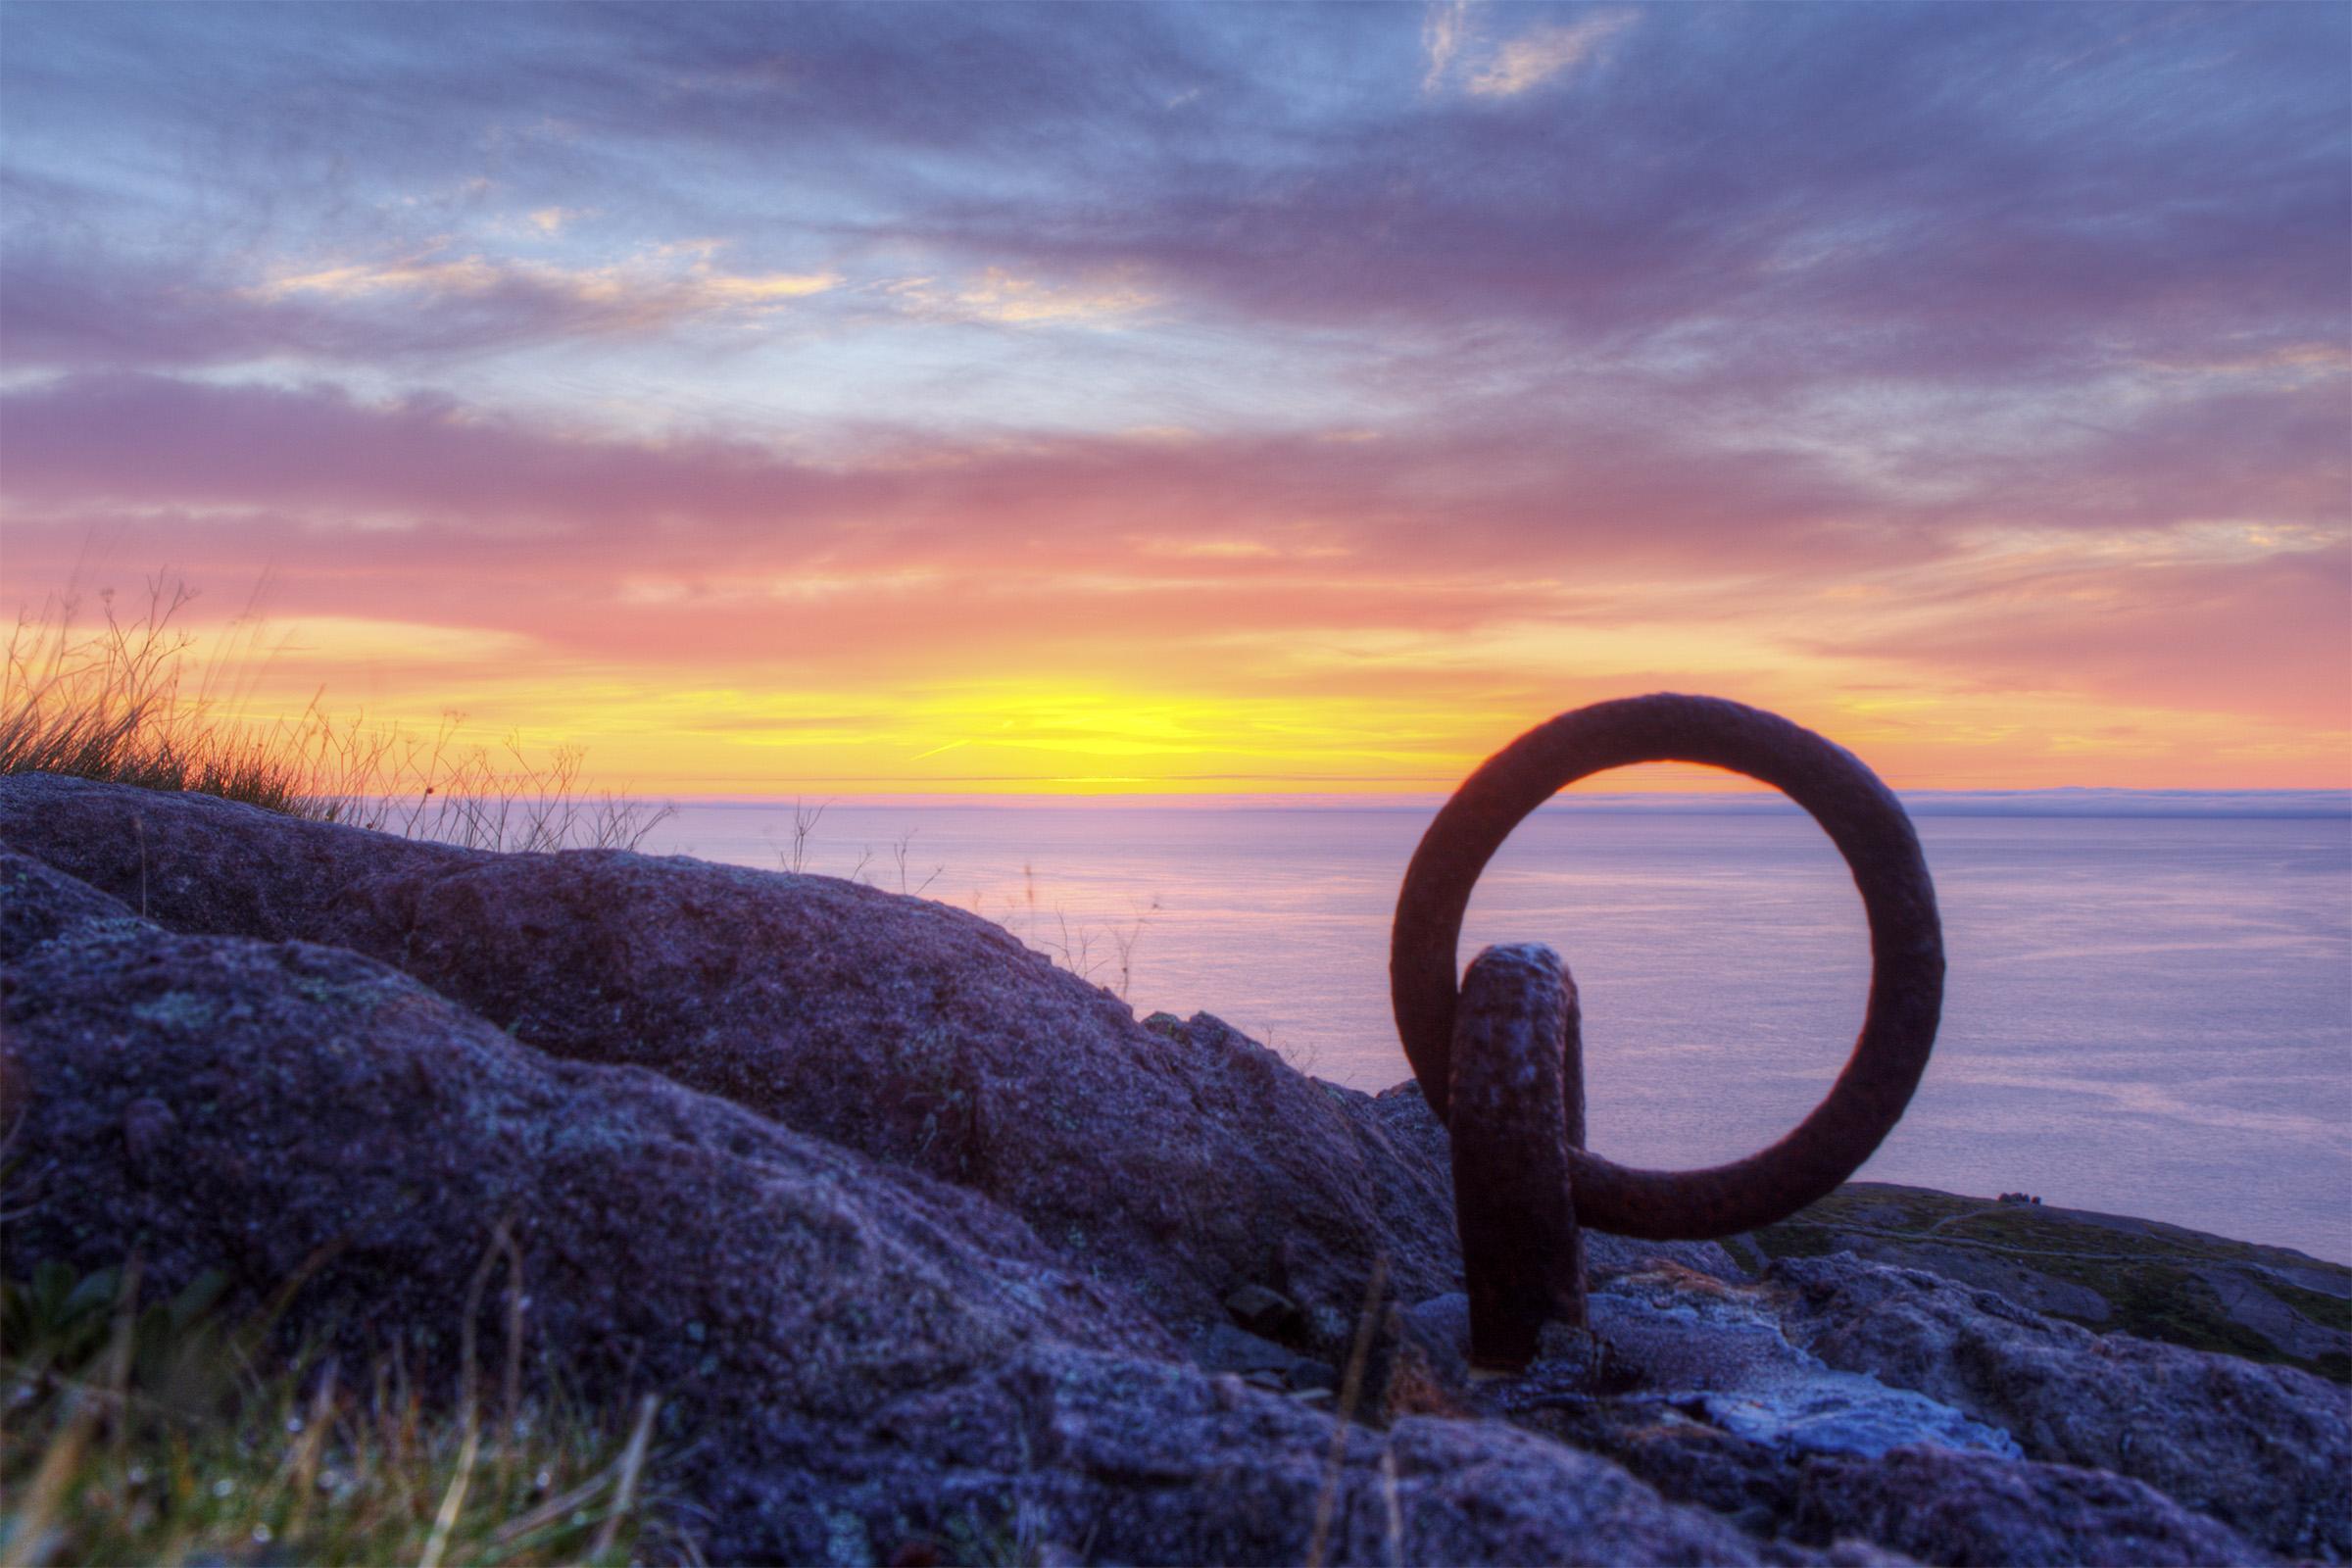 Sunrise in the Atlantic, Atlantic, Sun, Shoreline, Sky, HQ Photo